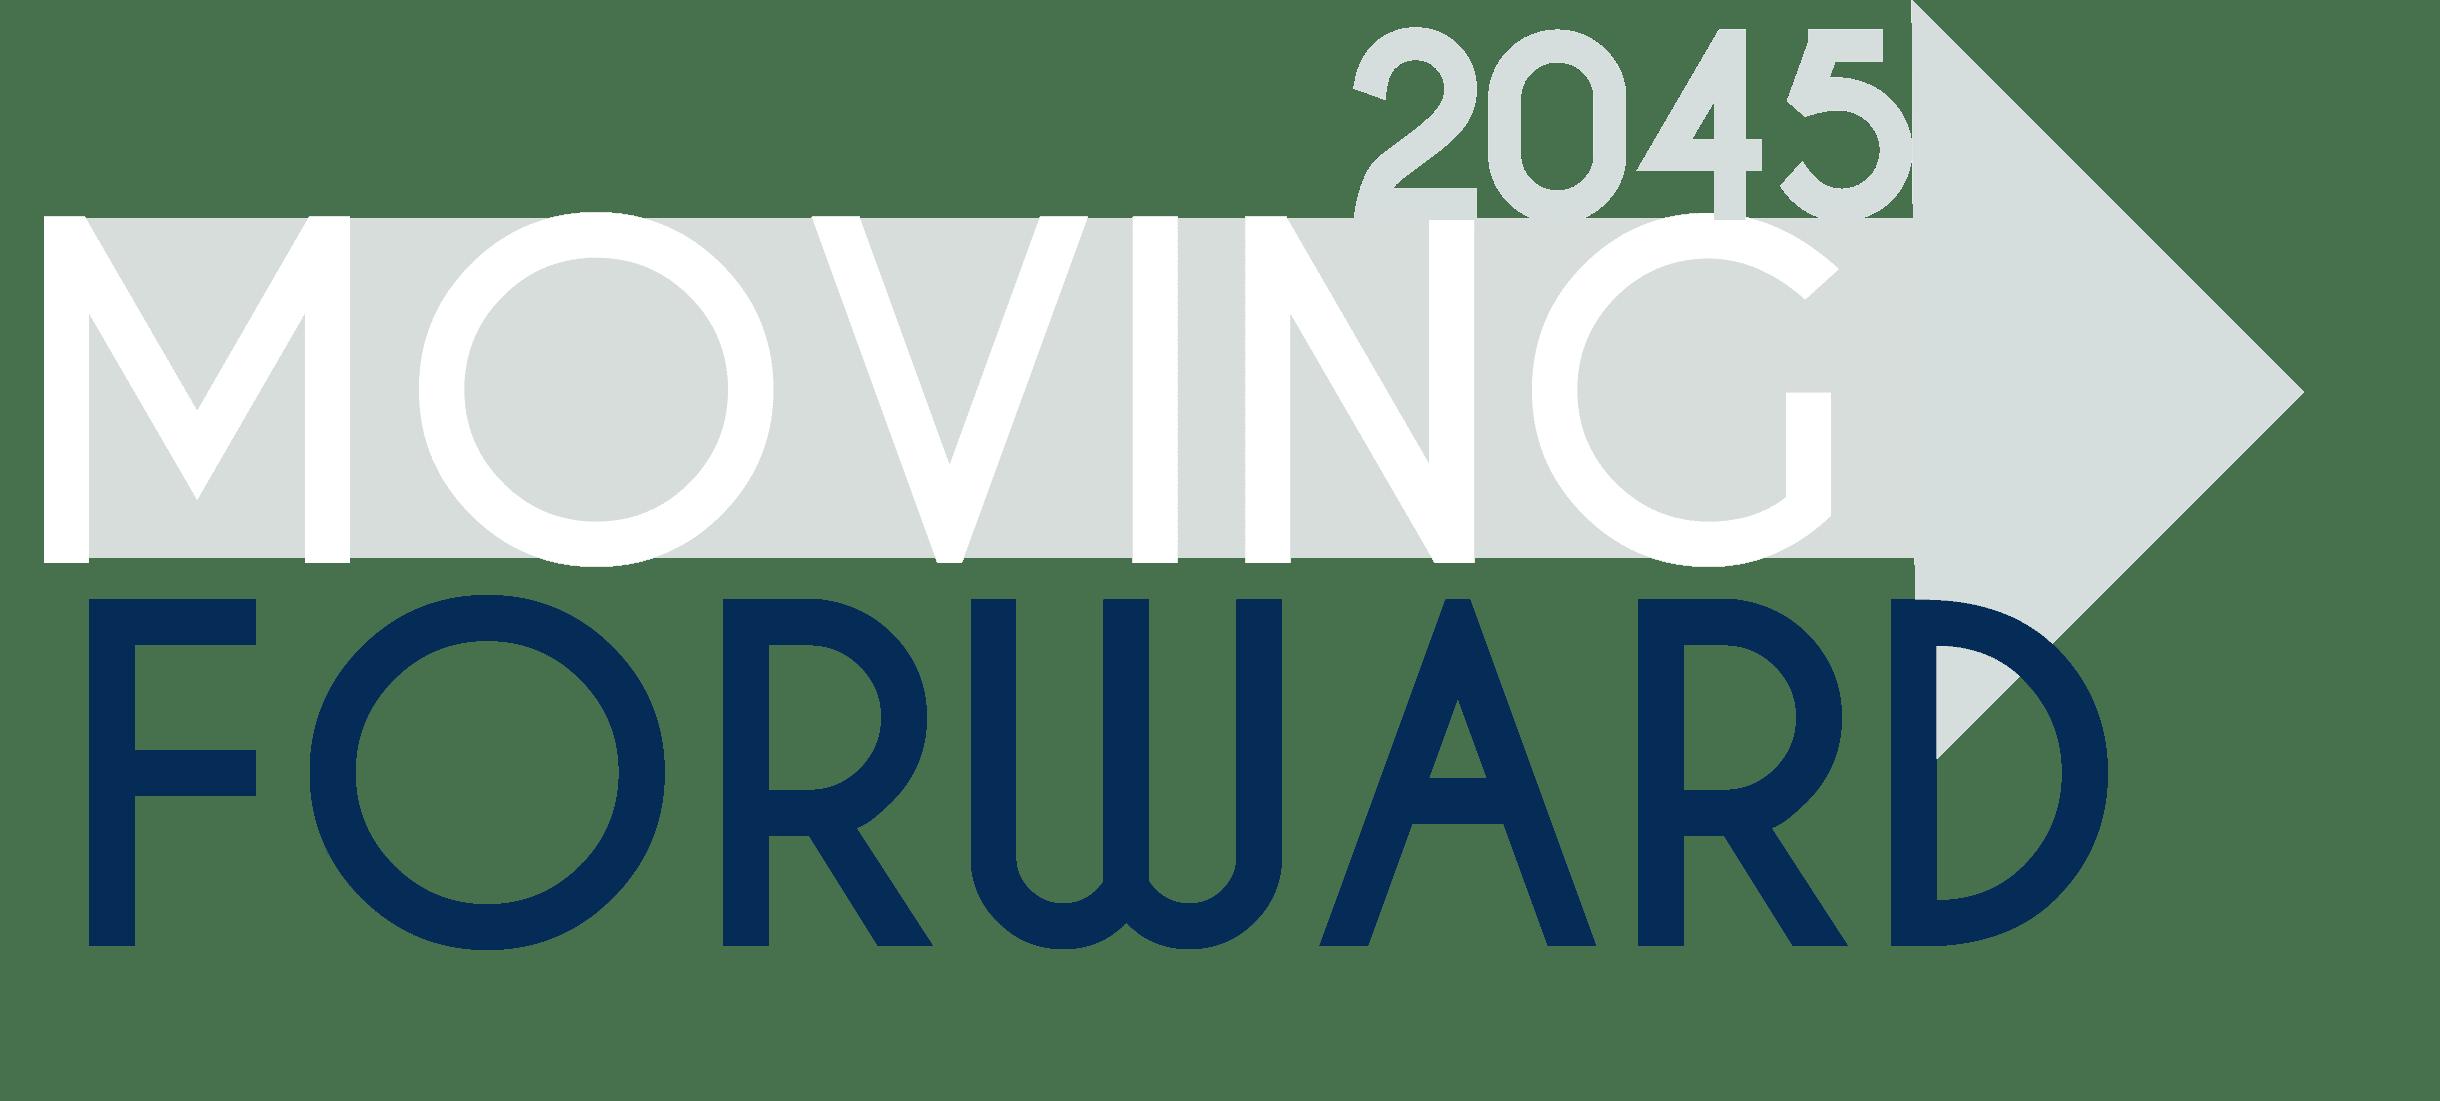 Moving Forward 2045 Logo